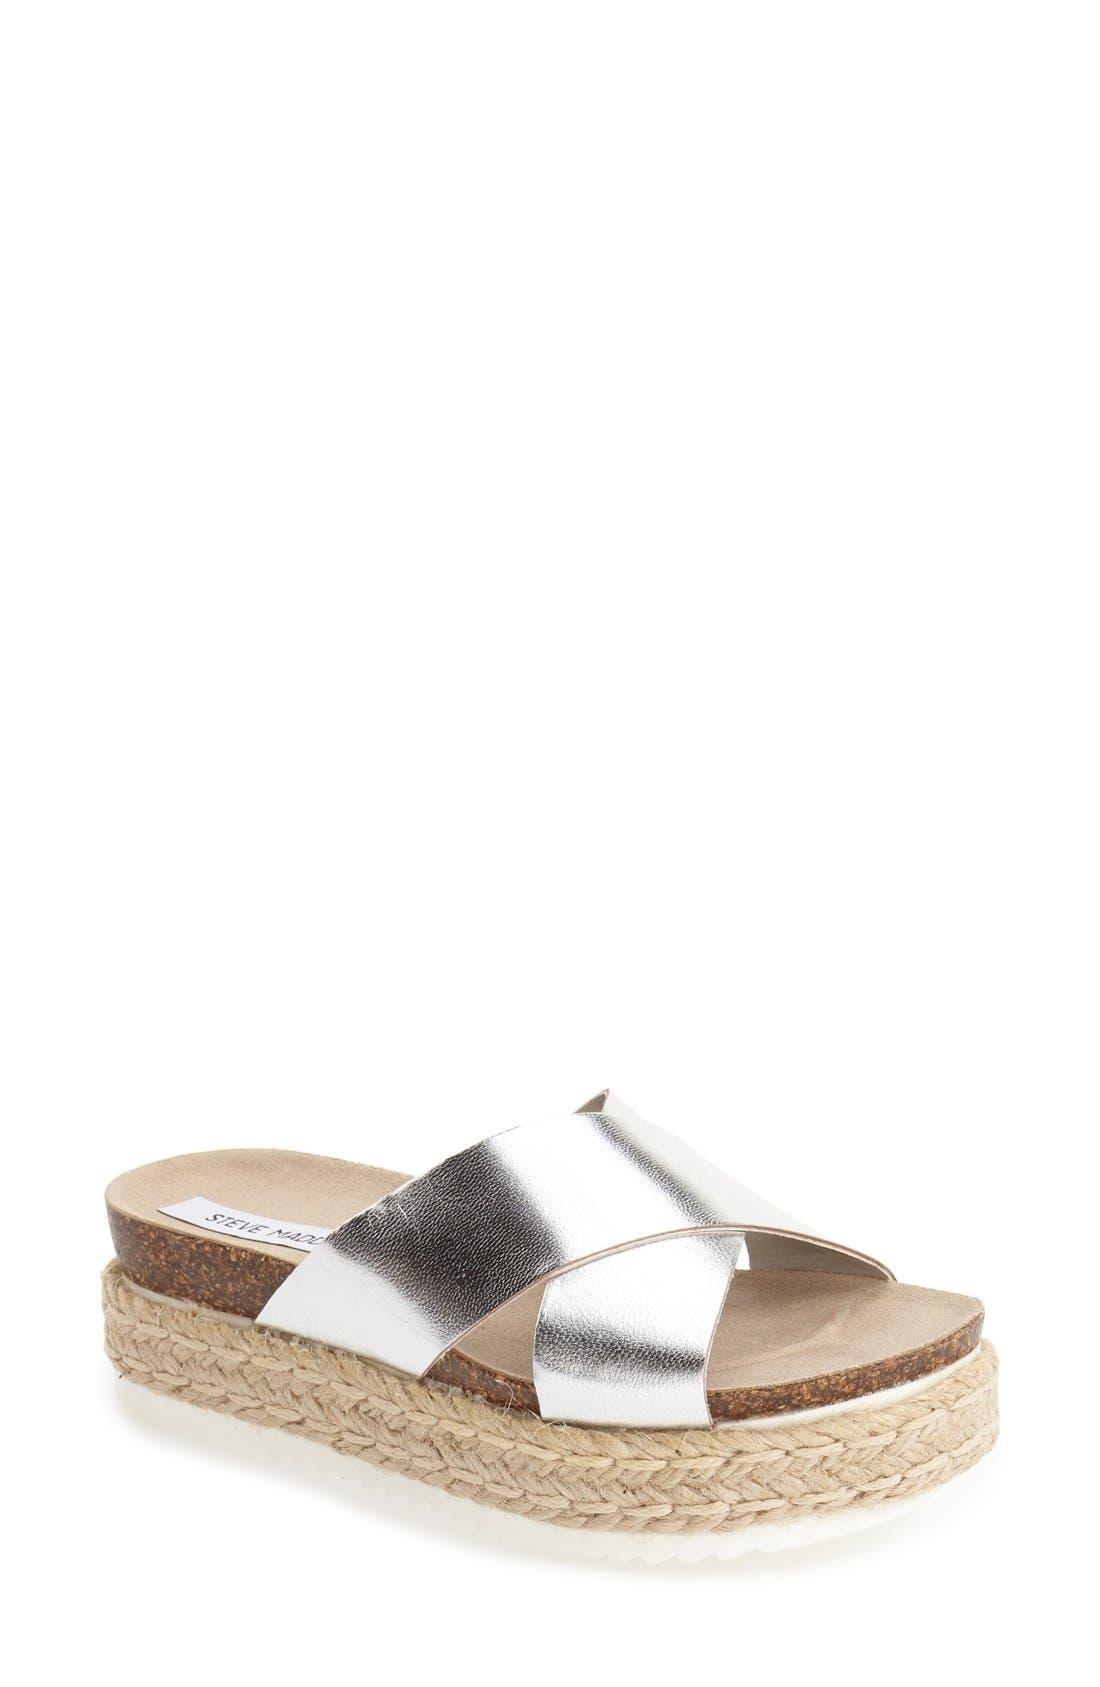 Main Image - Steve Madden 'Arran' Espadrille Platform Sandal (Women)